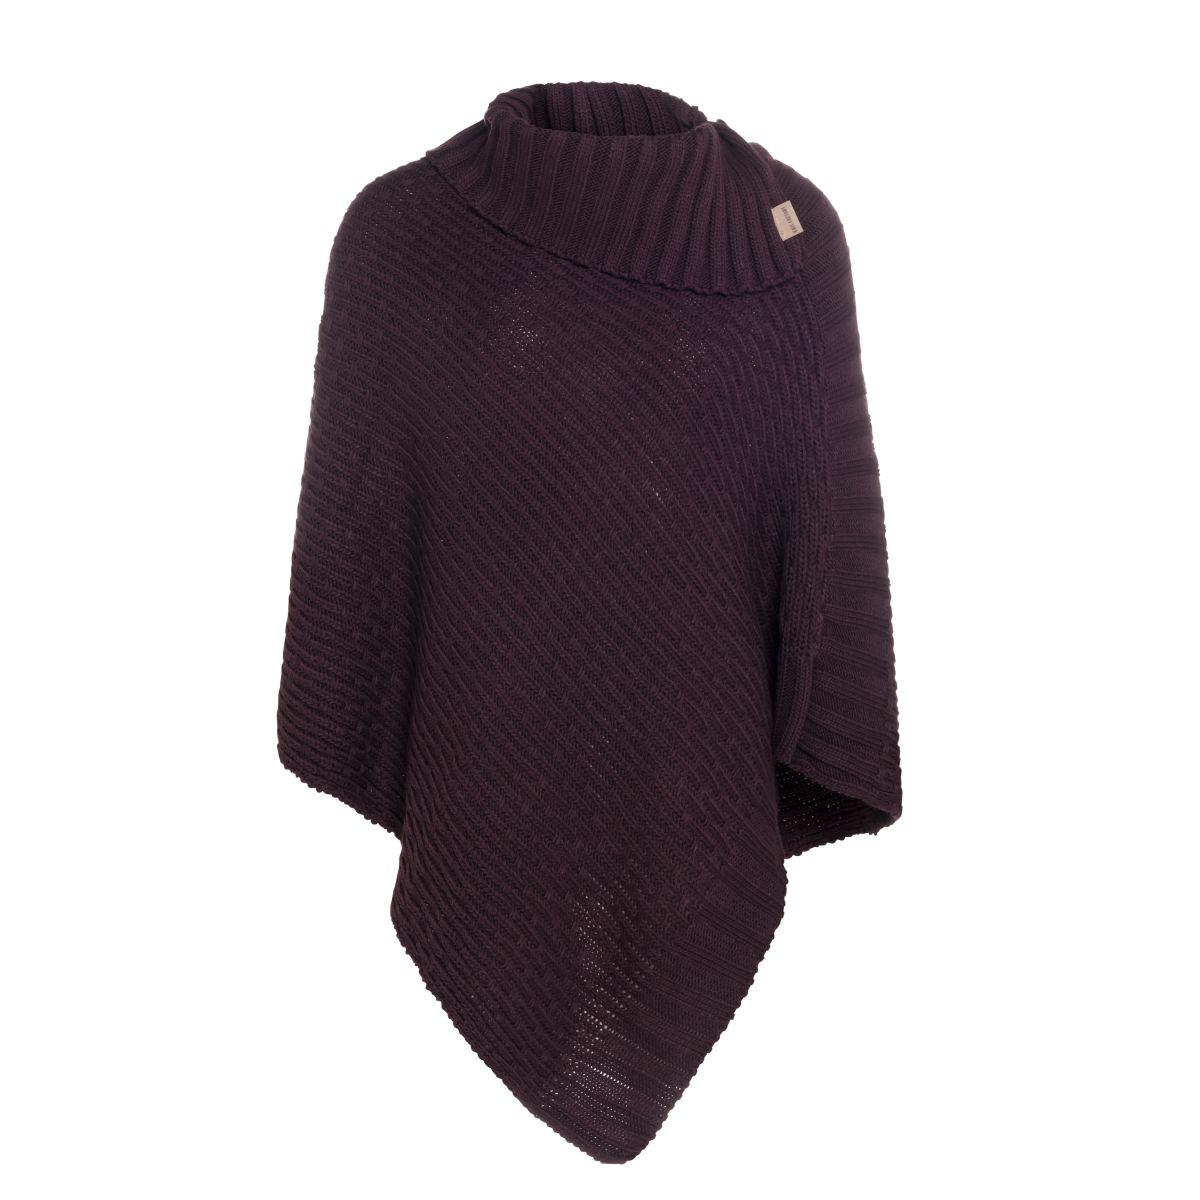 knit factory kf14806202350 nicky gebreide poncho aubergine 1